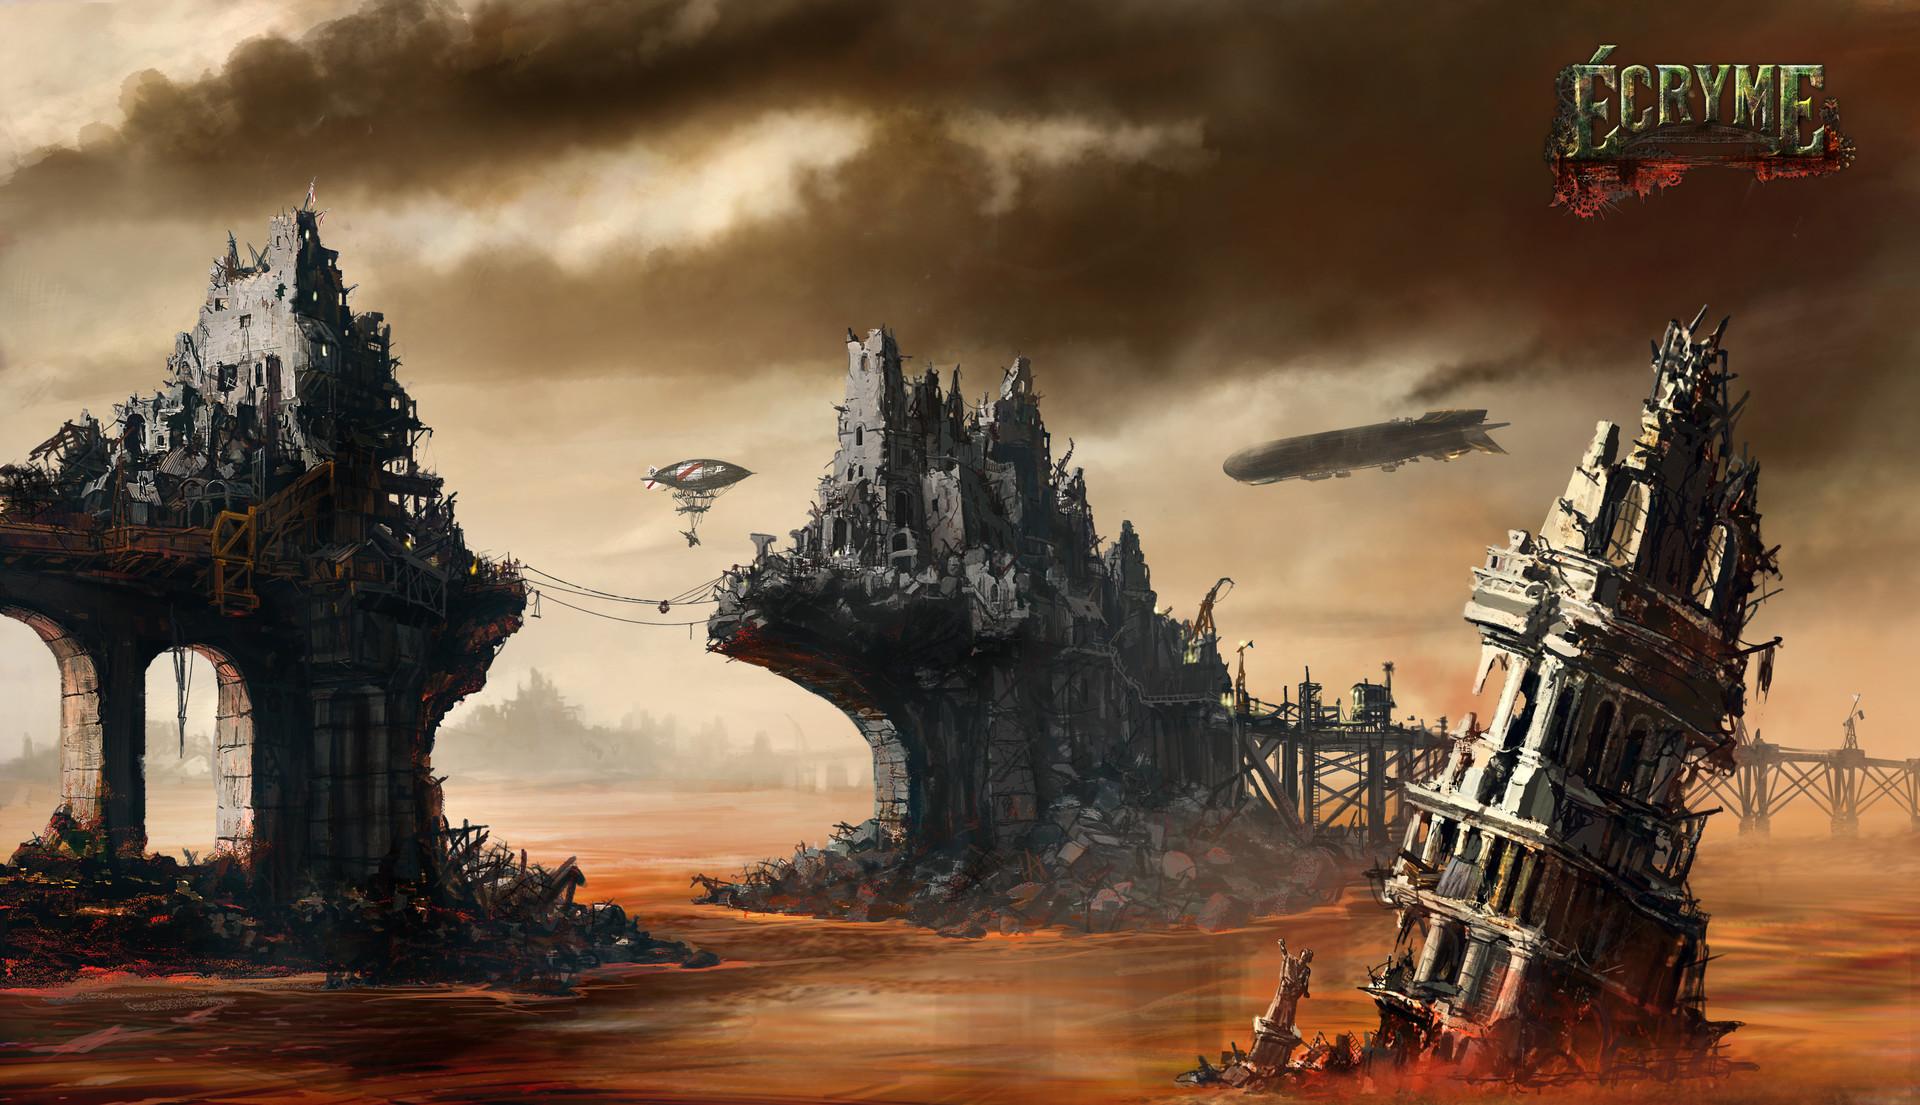 Remi le capon ecr ruines final